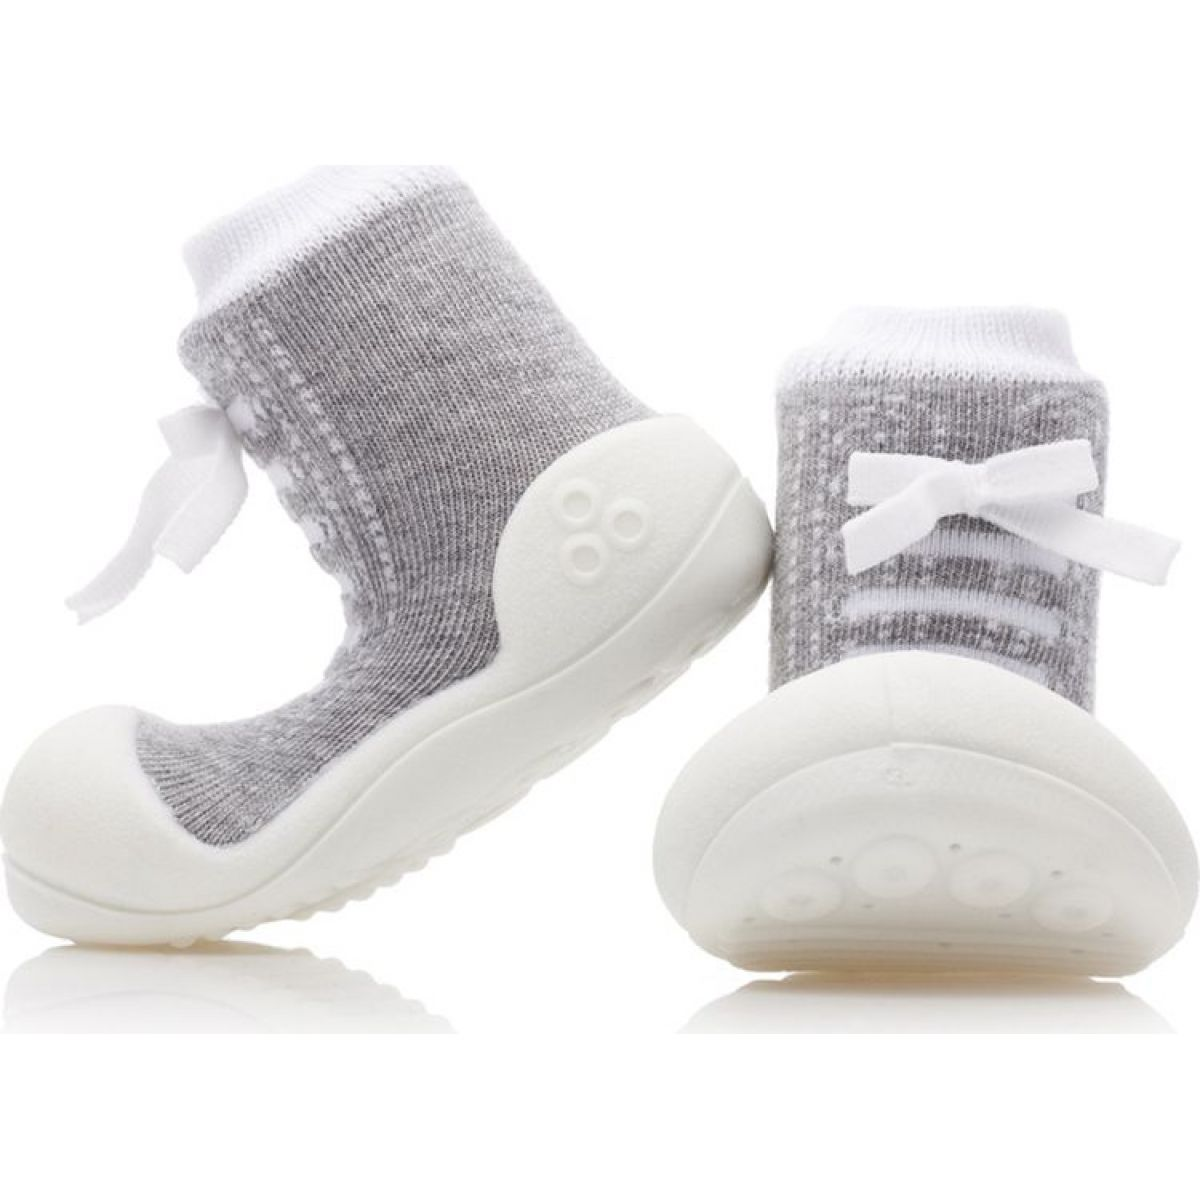 Attipas Sneakers Gray - Euro 20